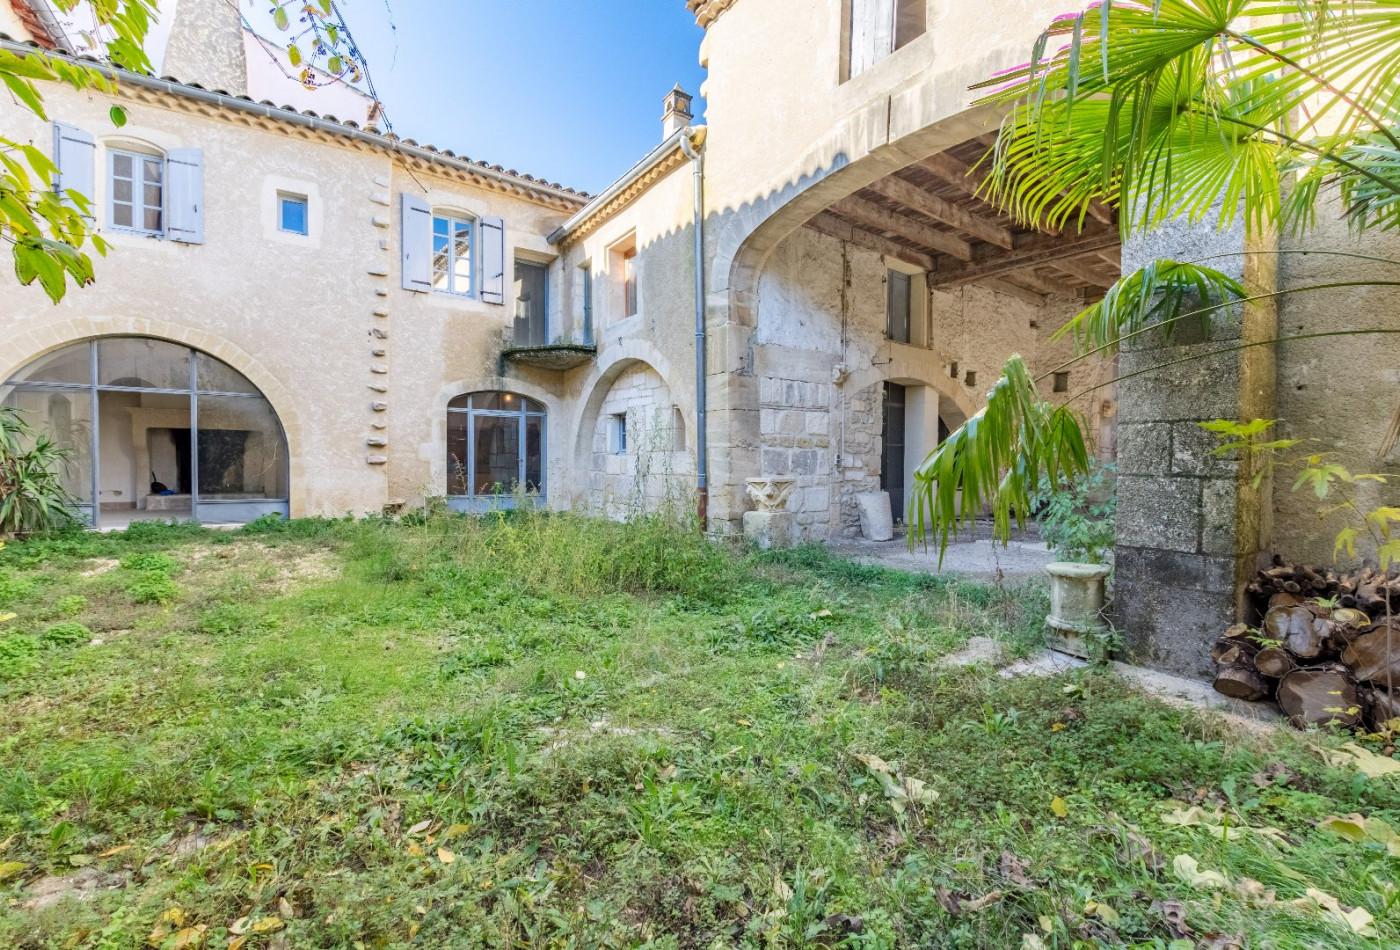 A vendre  Montpellier   Réf 340146713 - Agence galerie casanova